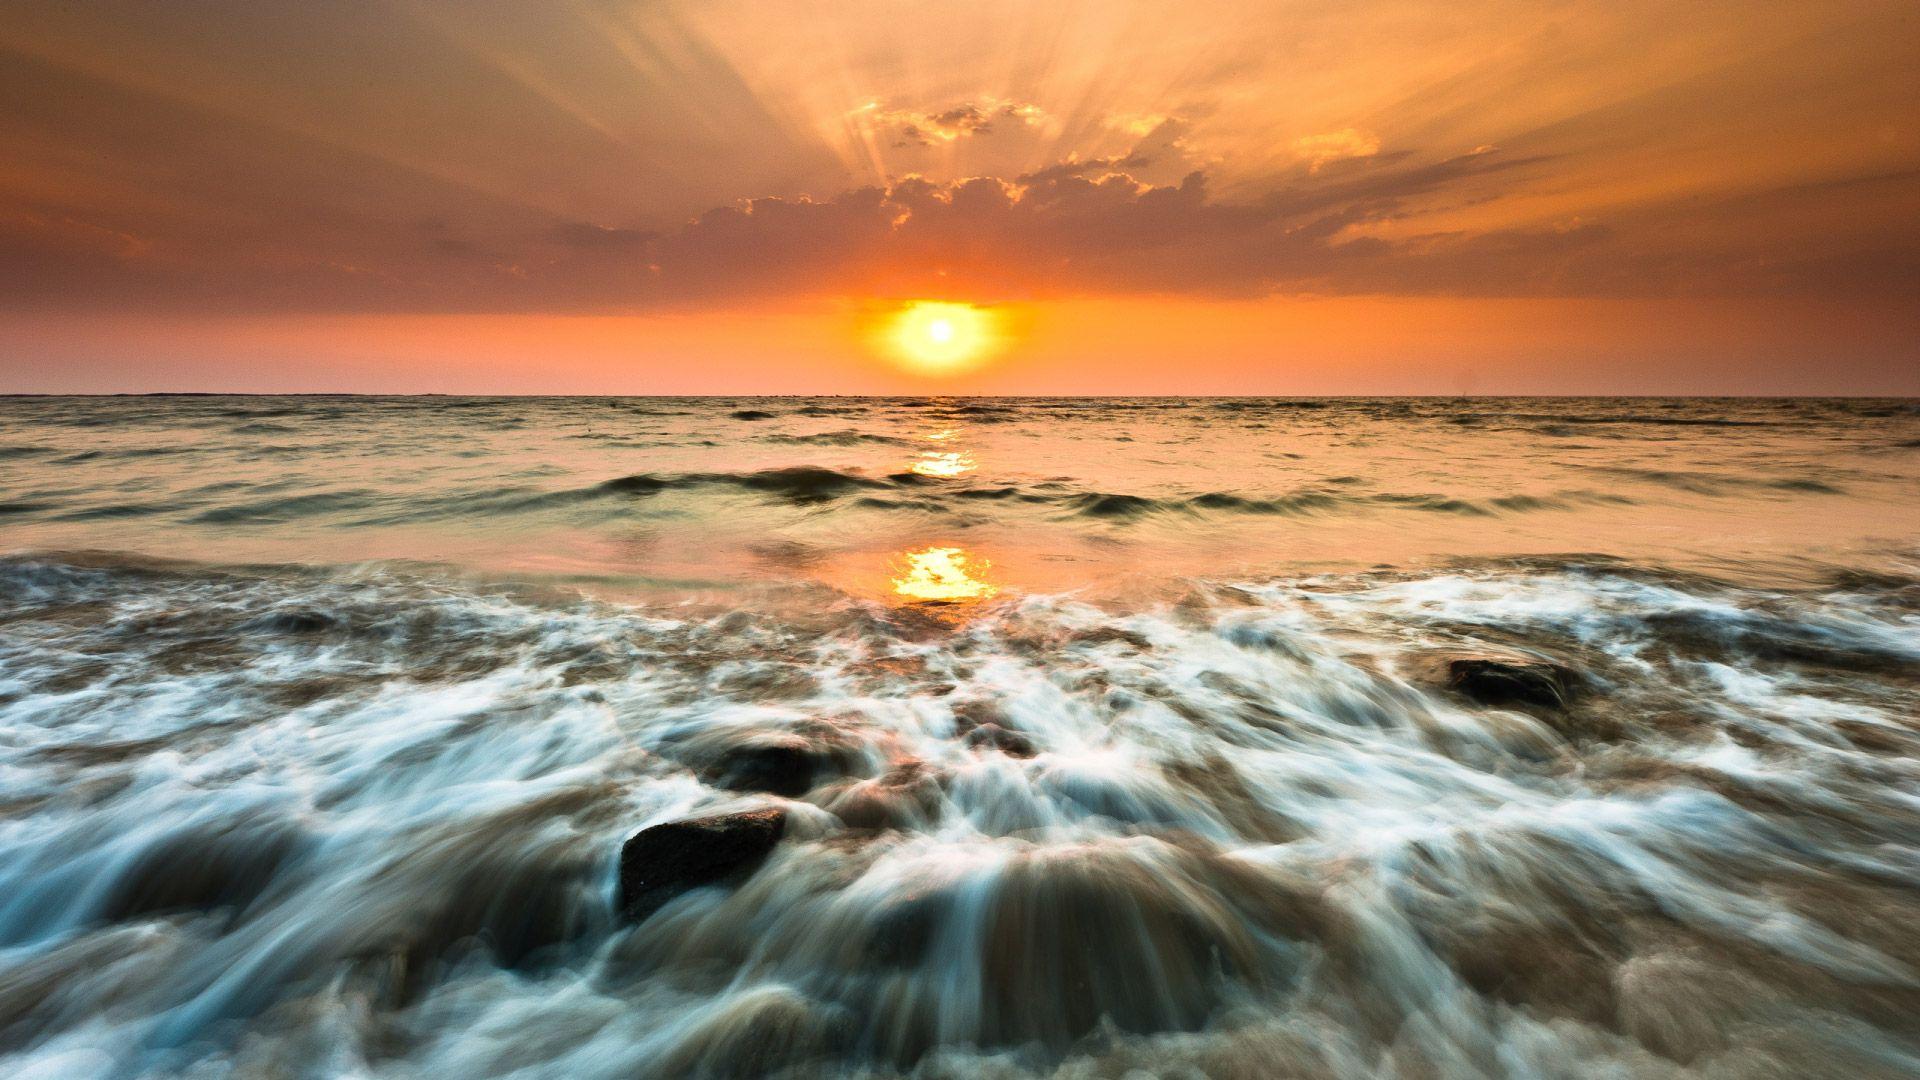 Ocean Sunset wallpaper photo